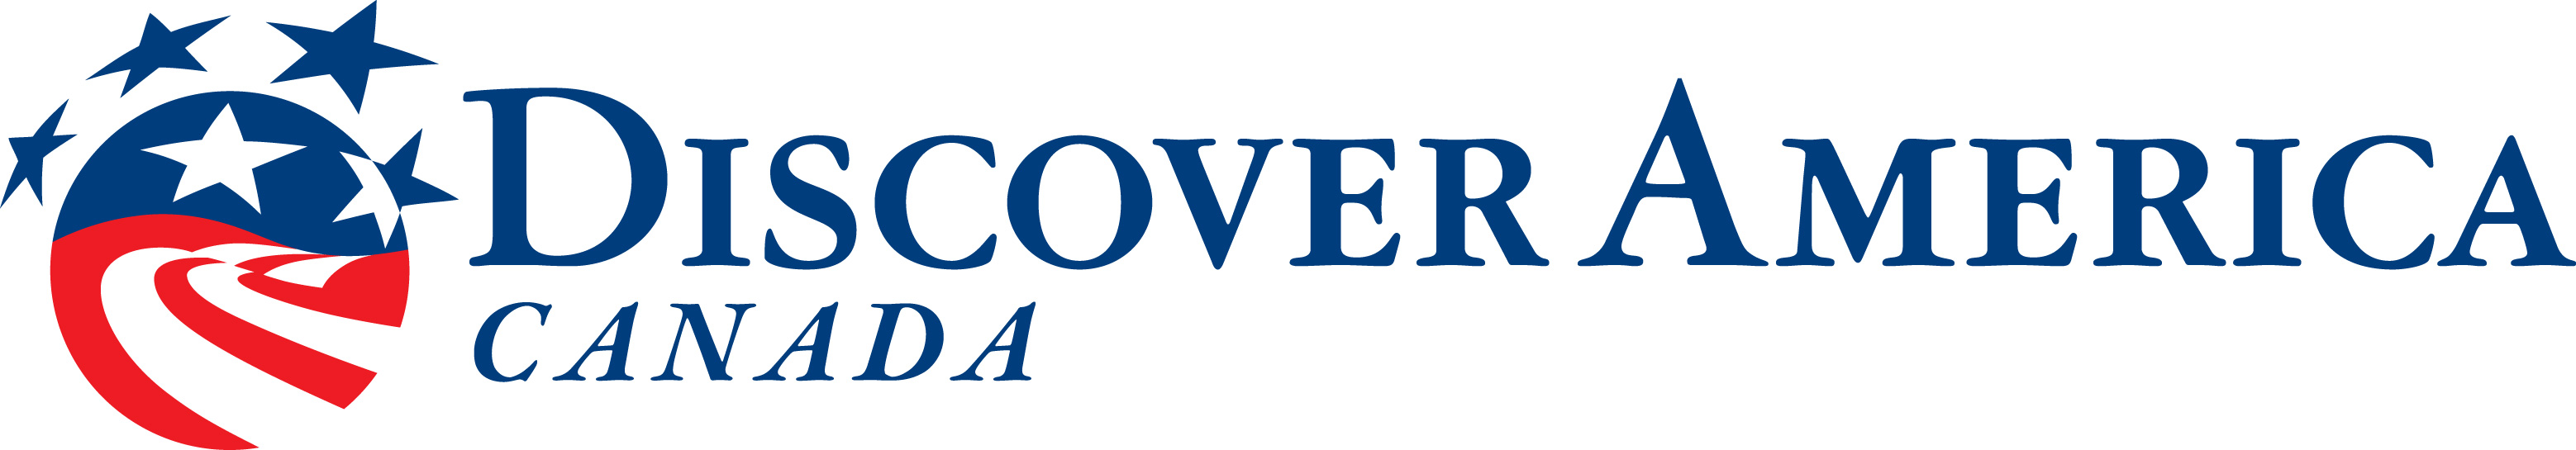 Discover America Canada